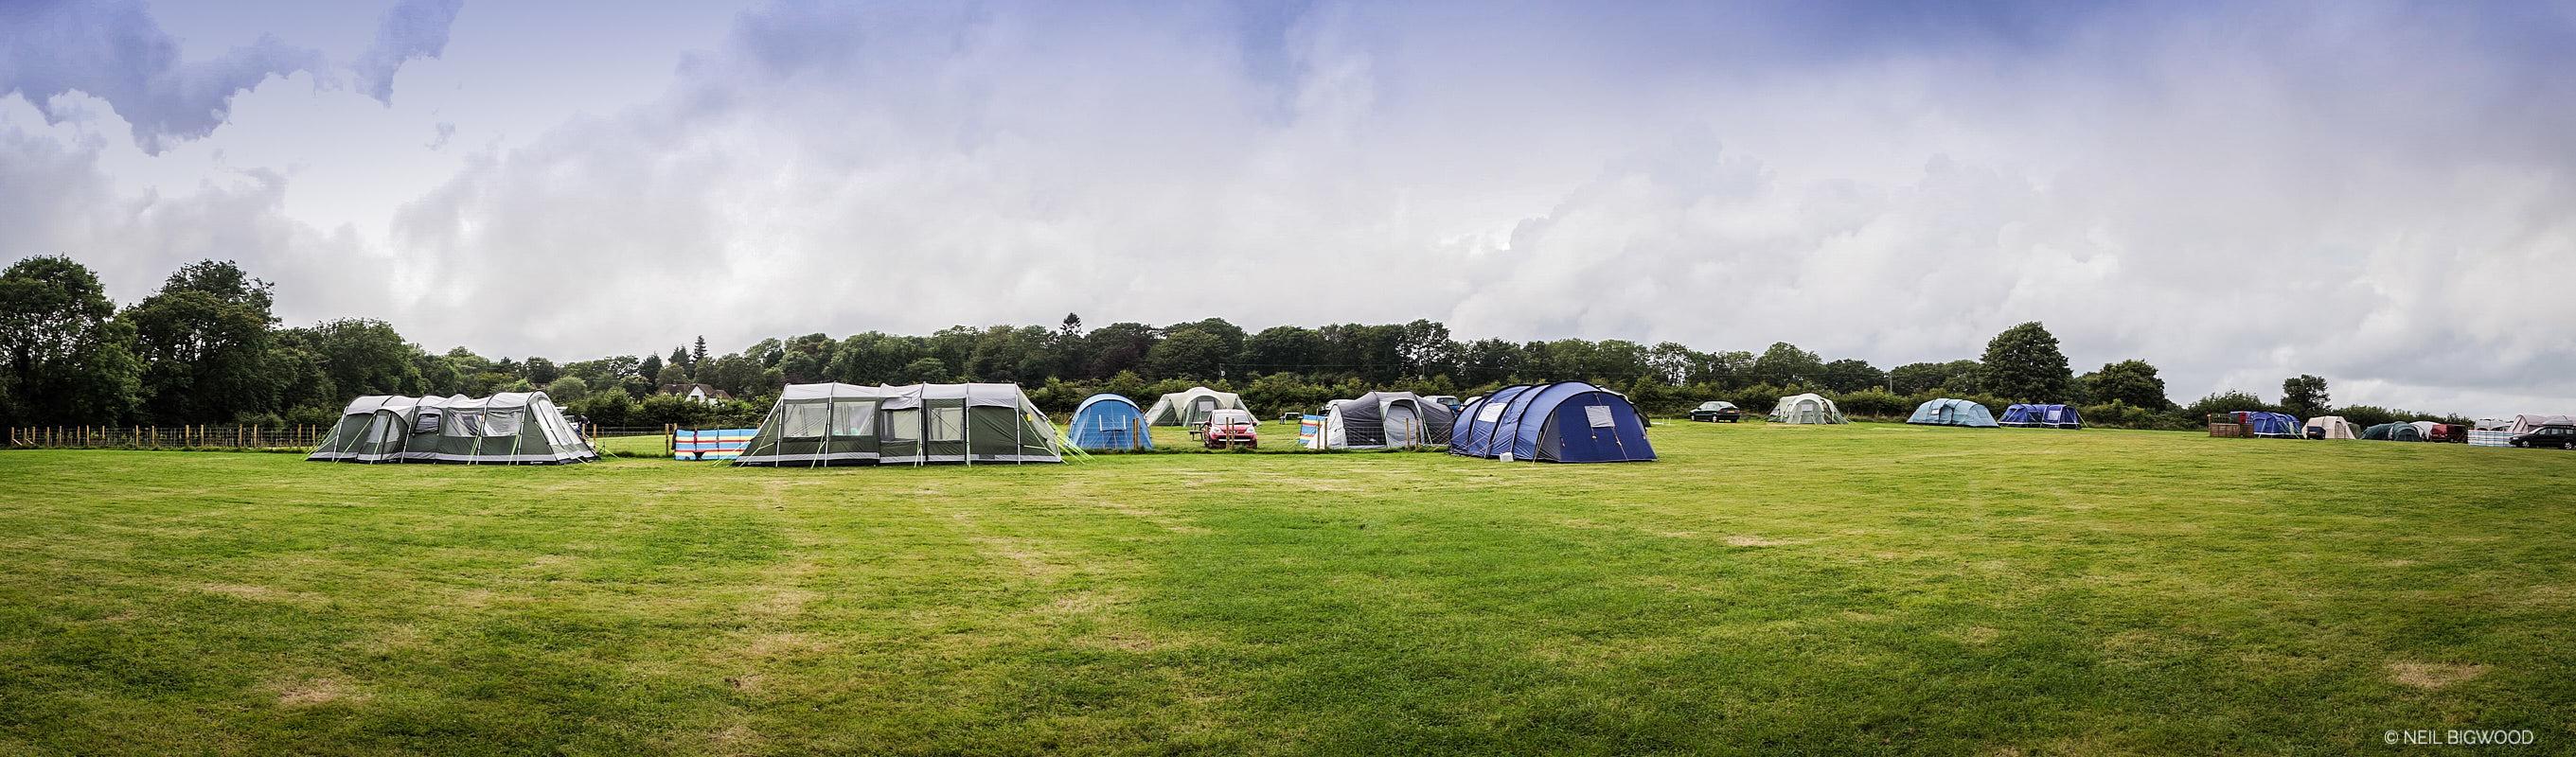 Neil-Bigwood-Monkton-Wyld-Camping-74